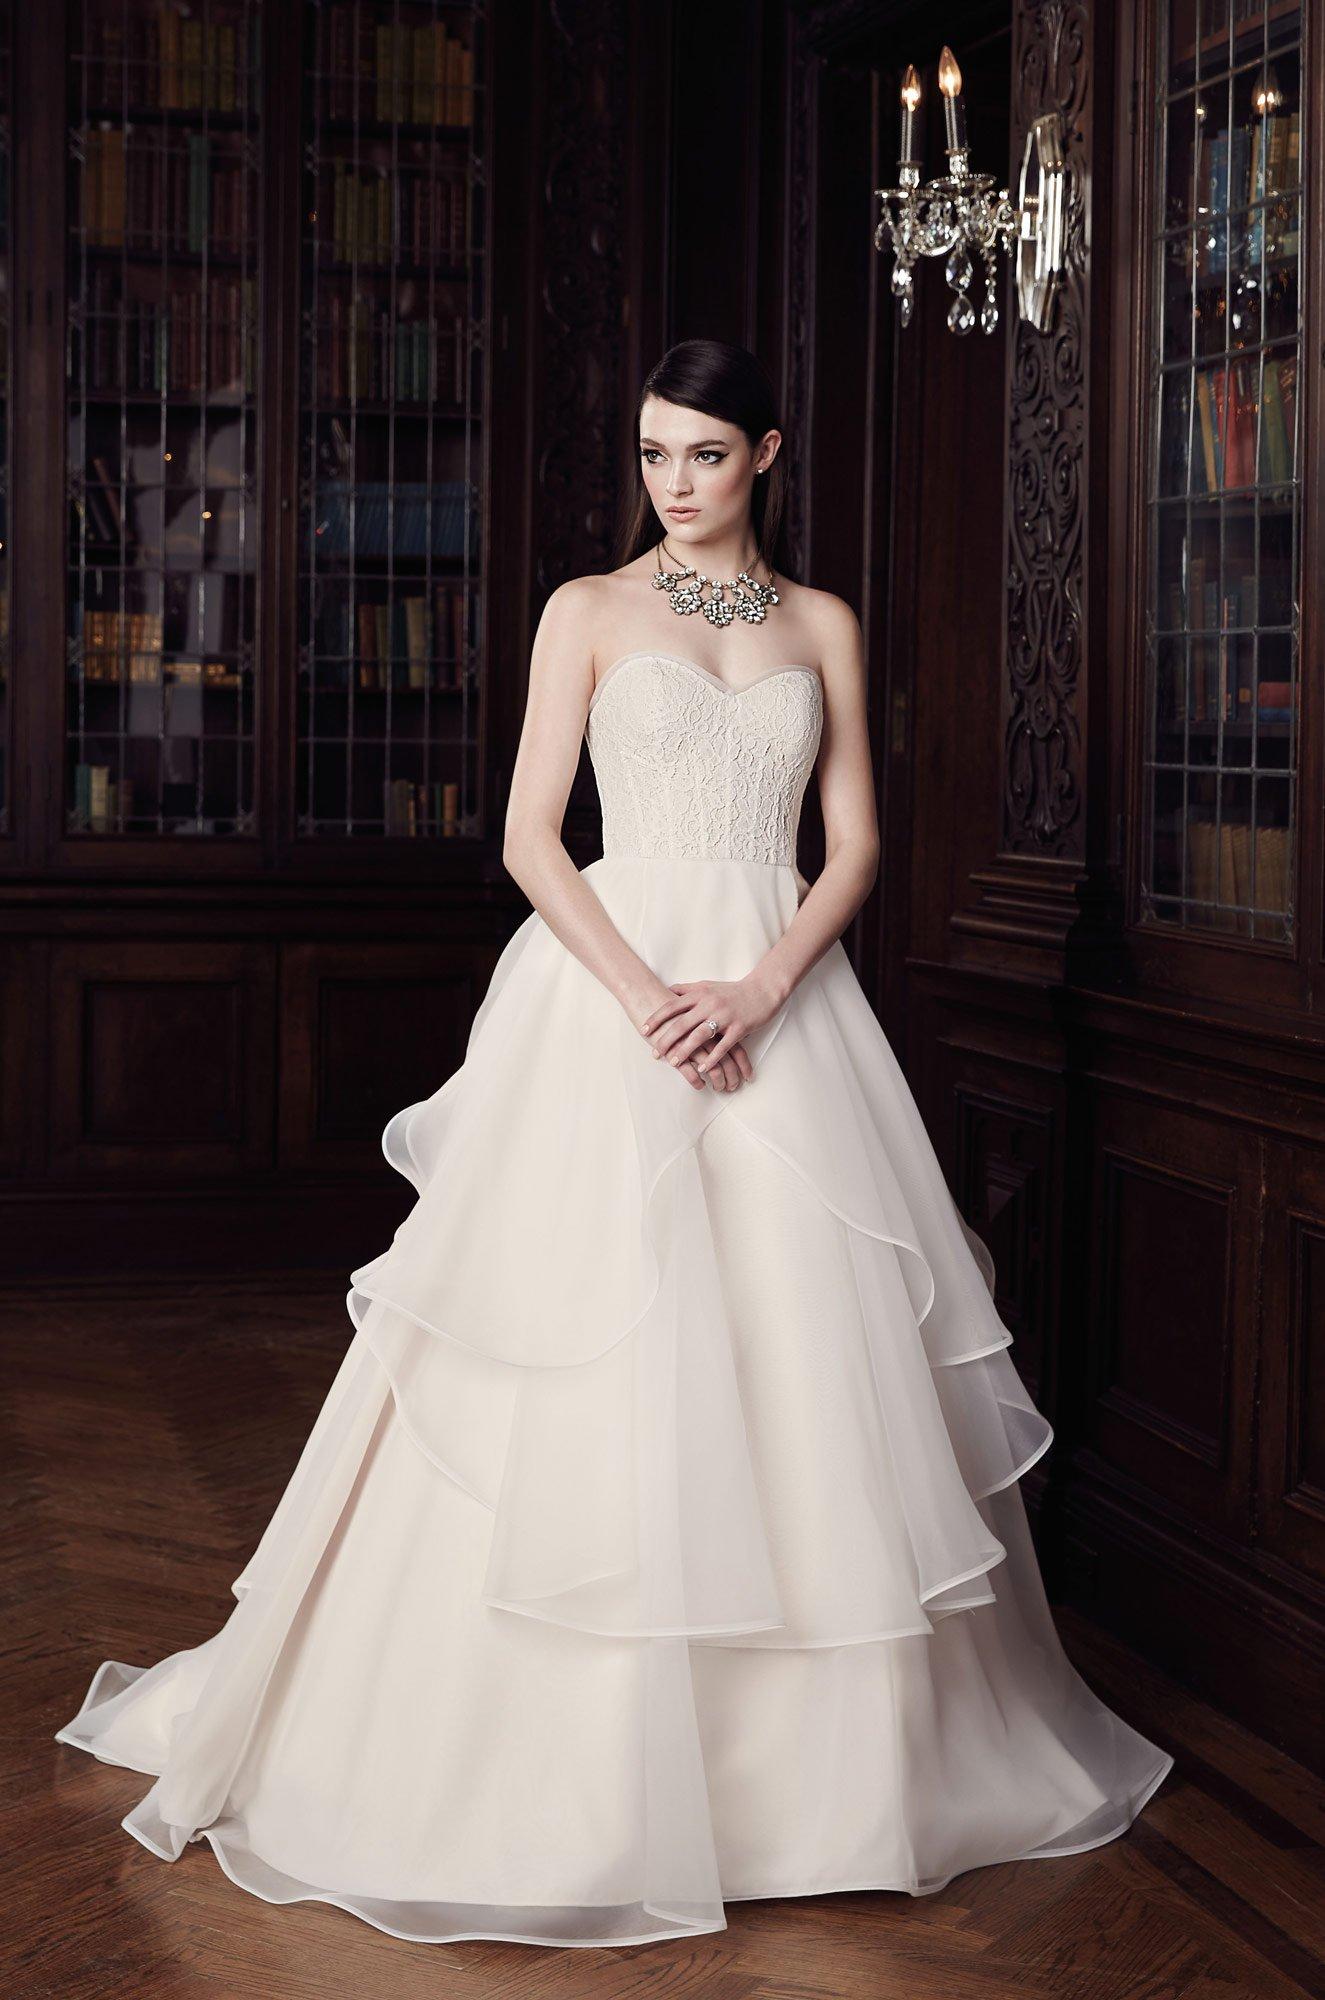 Strapless Ball Gown Wedding Dress - Style #2003 | Mikaella Bridal